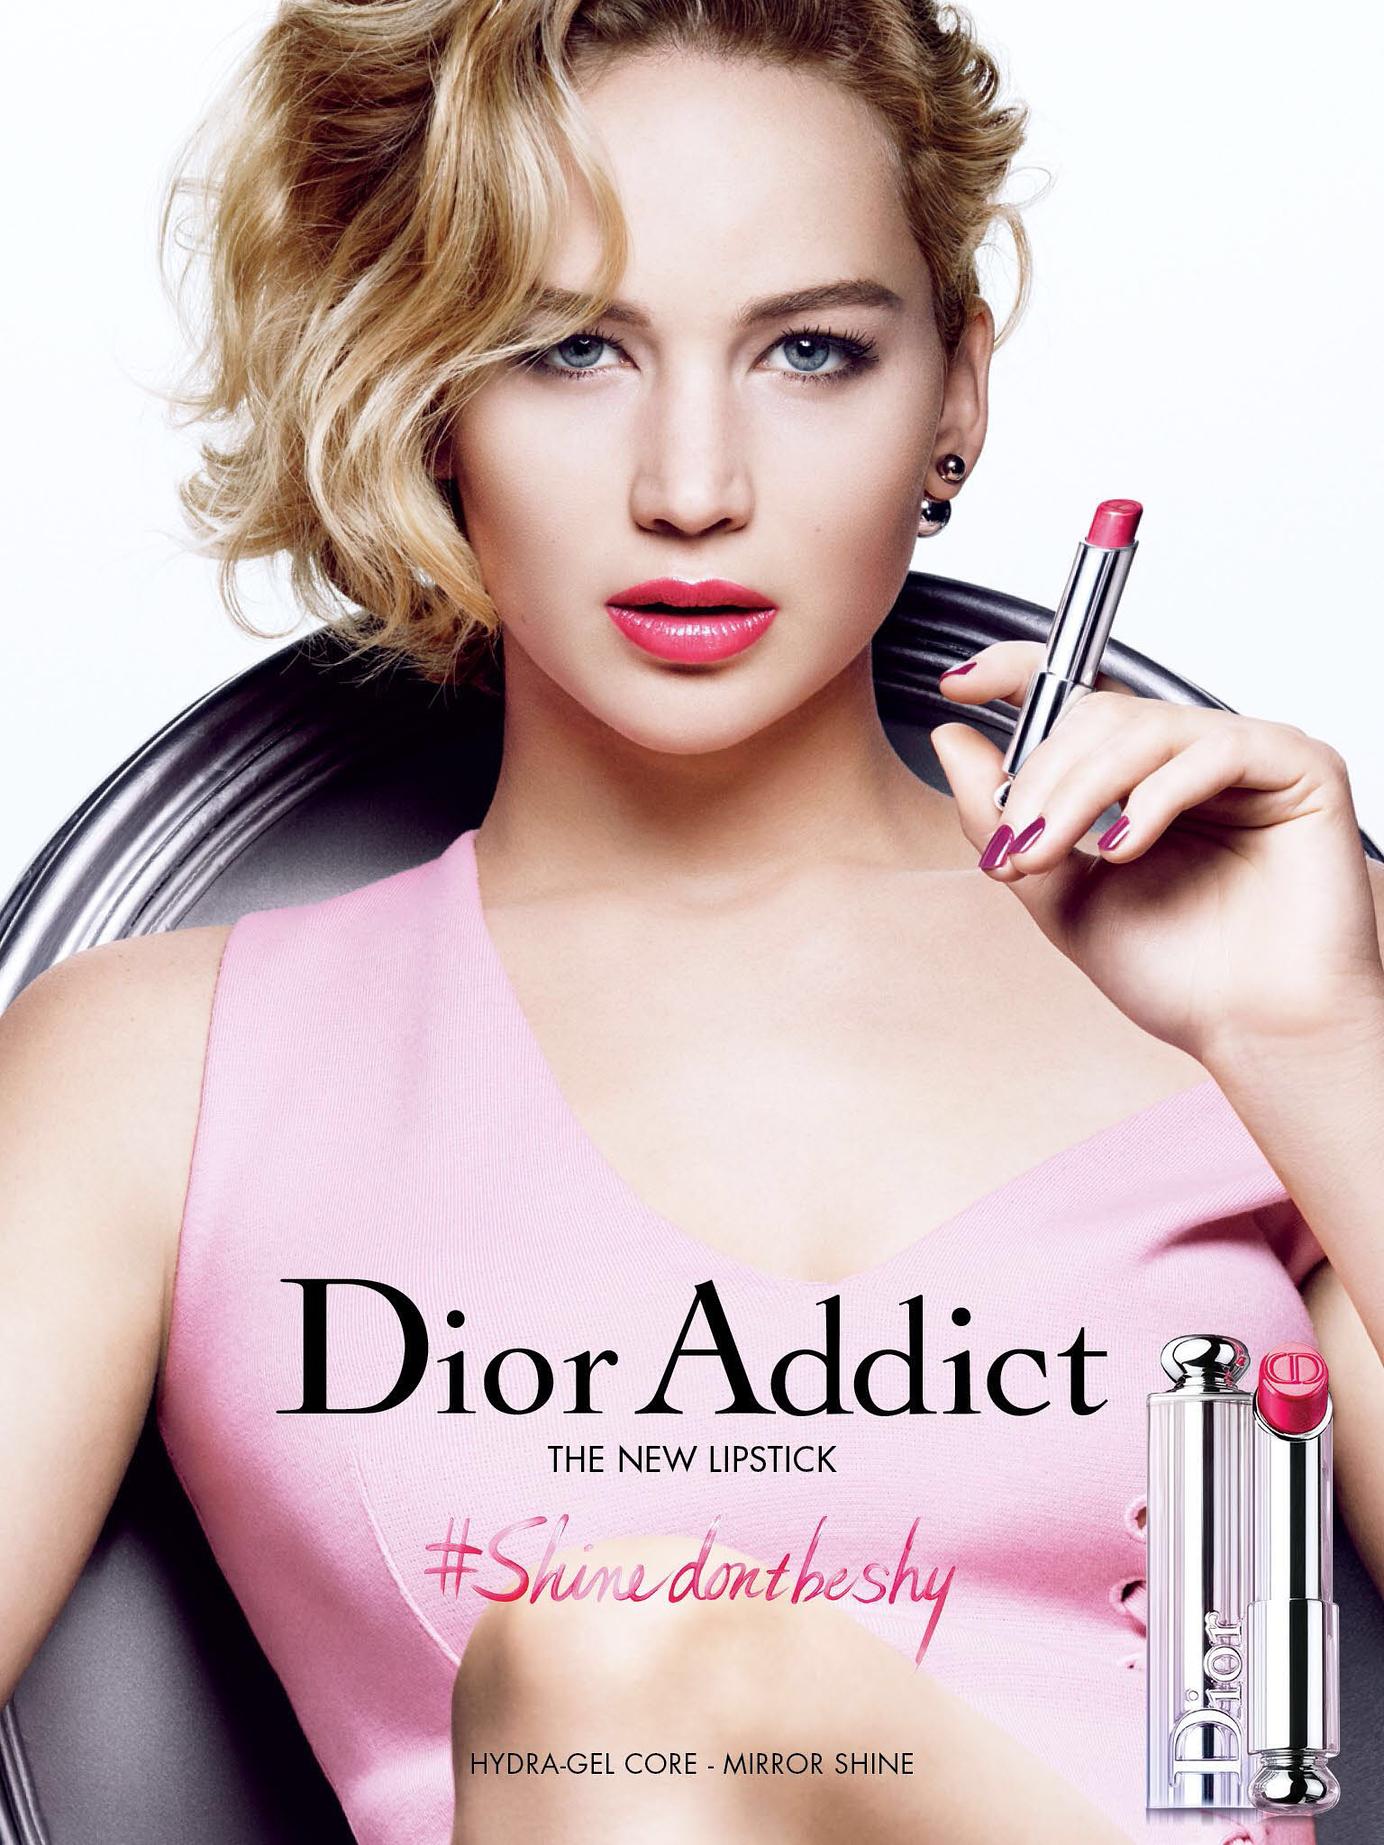 "JENNIFER LAWRENCE | DIOR PARIS COSMETICS ""DIOR ADDICT "" CAMPAIGN  ADVERTISEMENT | Dior addict lipstick, Dior beauty campaign, Dior beauty"